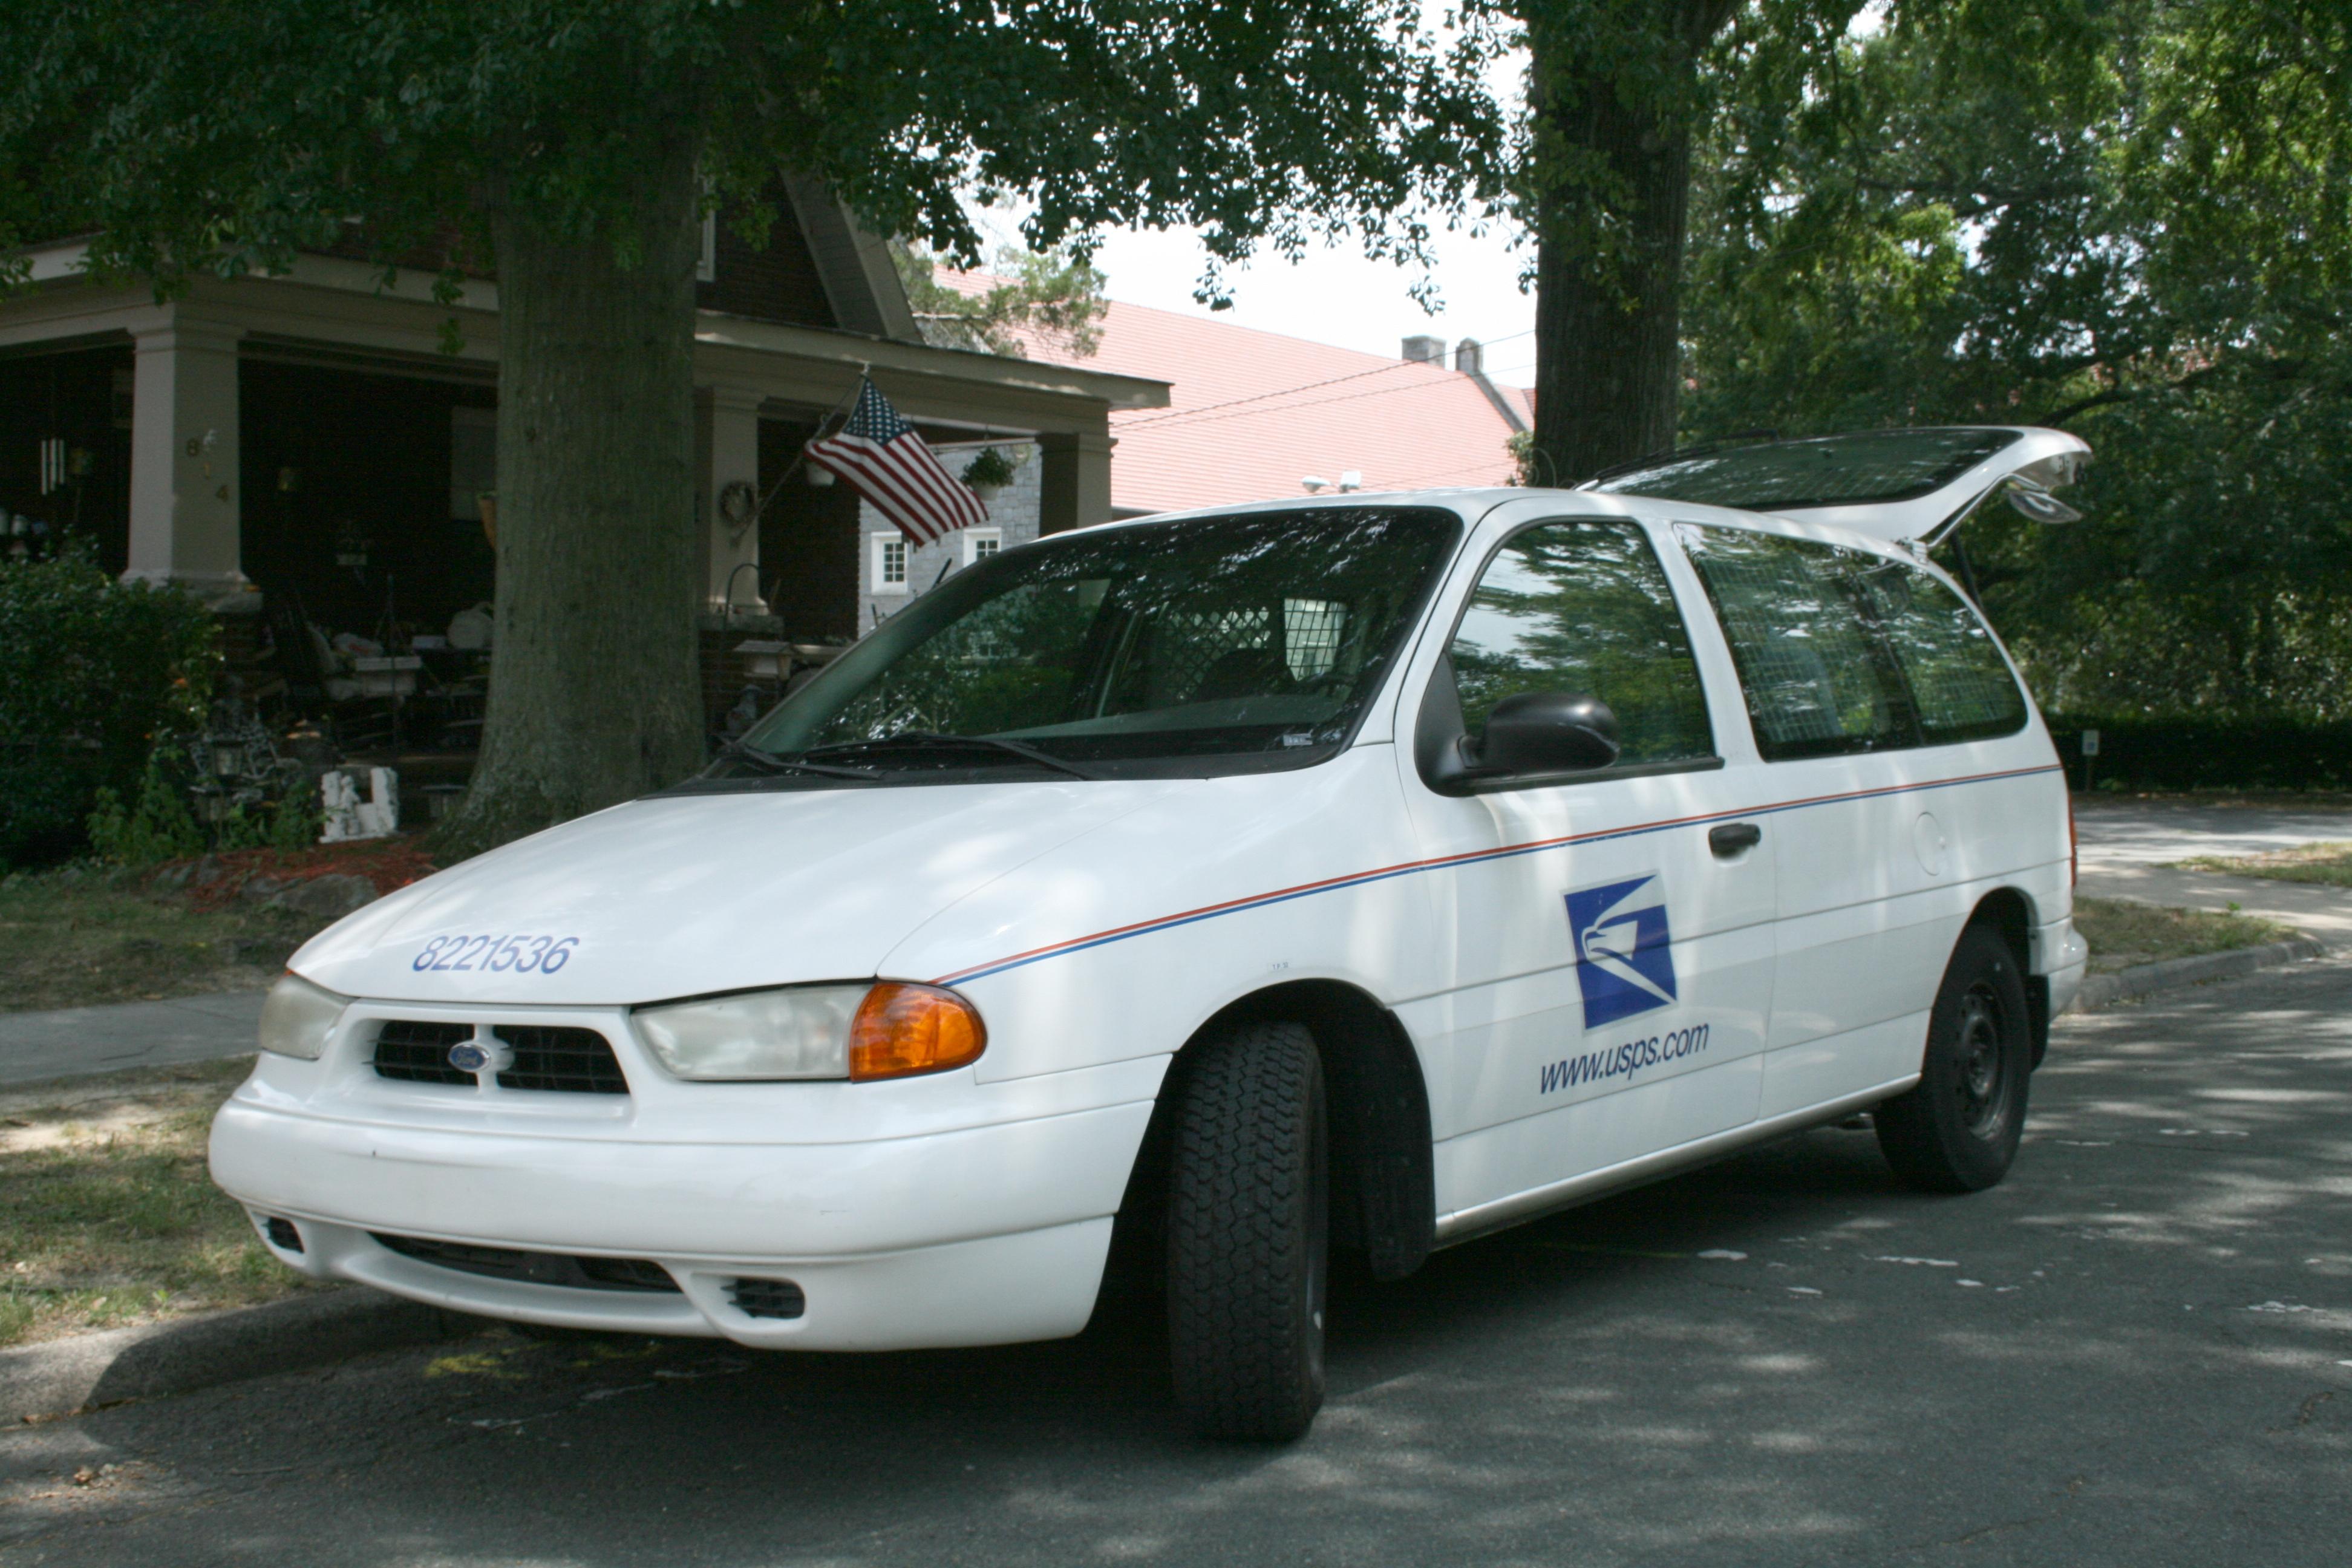 Postal Delivery Van In Durham